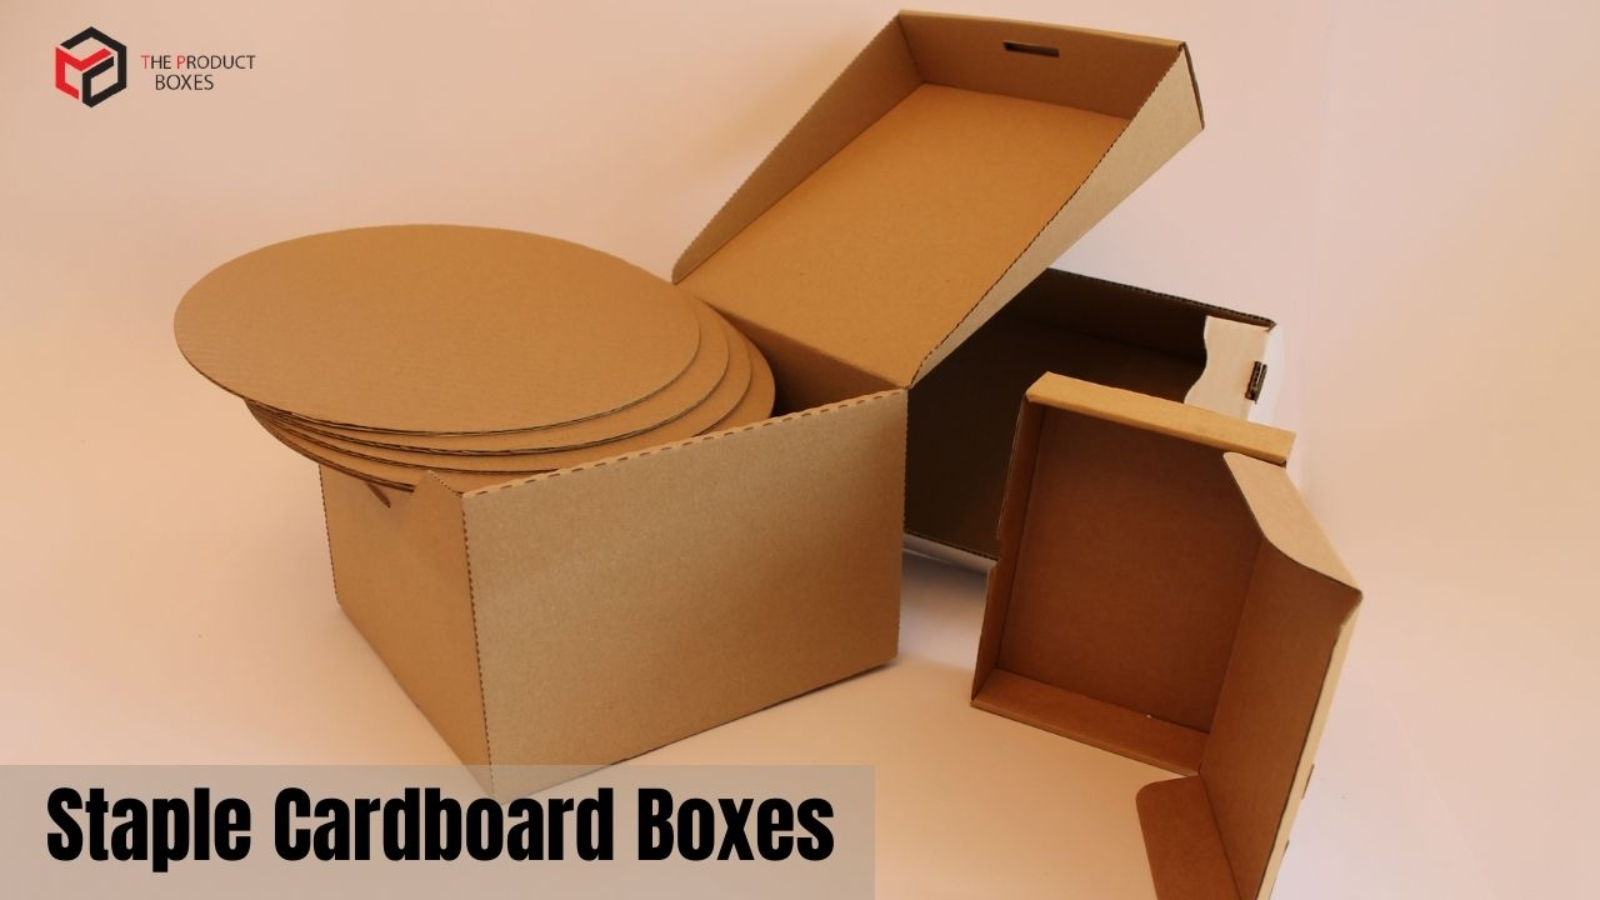 staple cardboard boxes